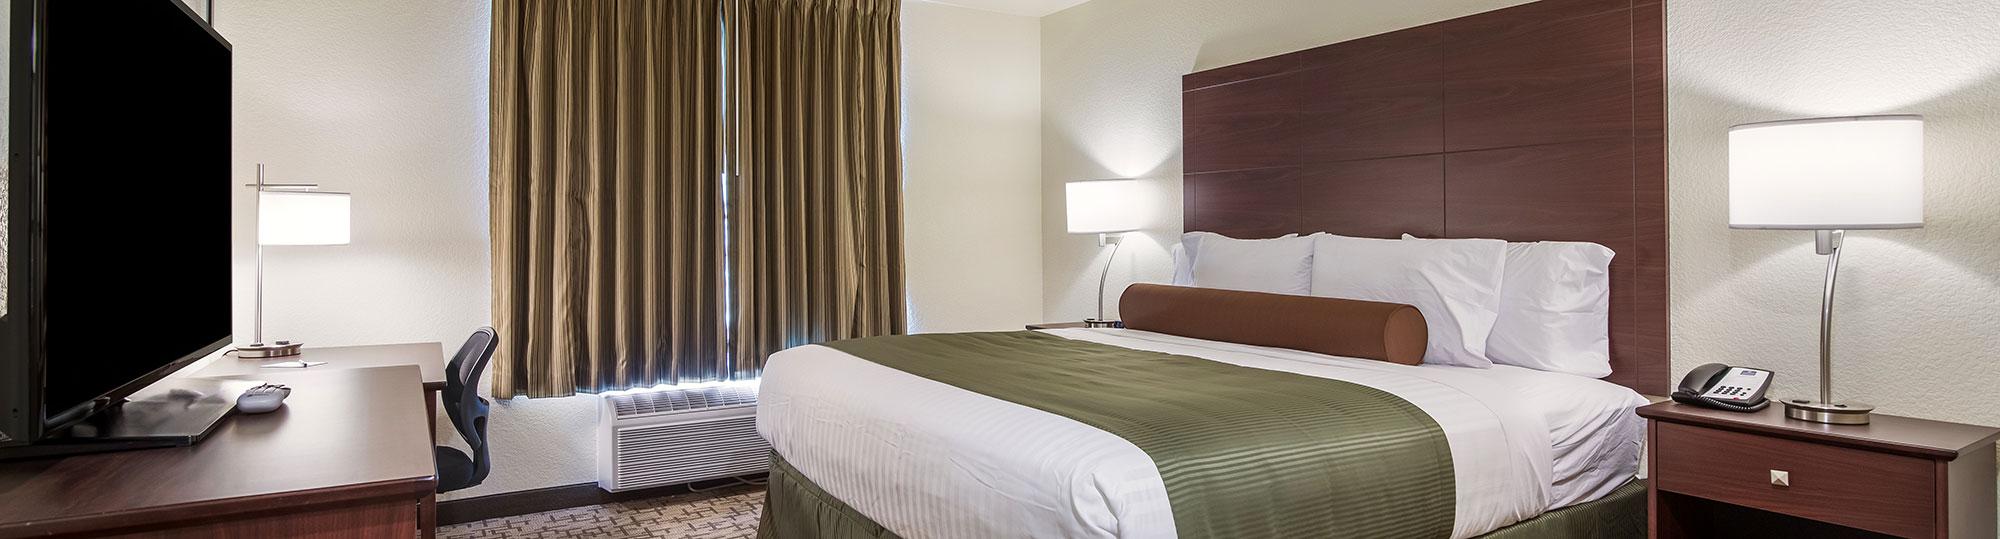 Cobblestone Hotel & Suites Victor